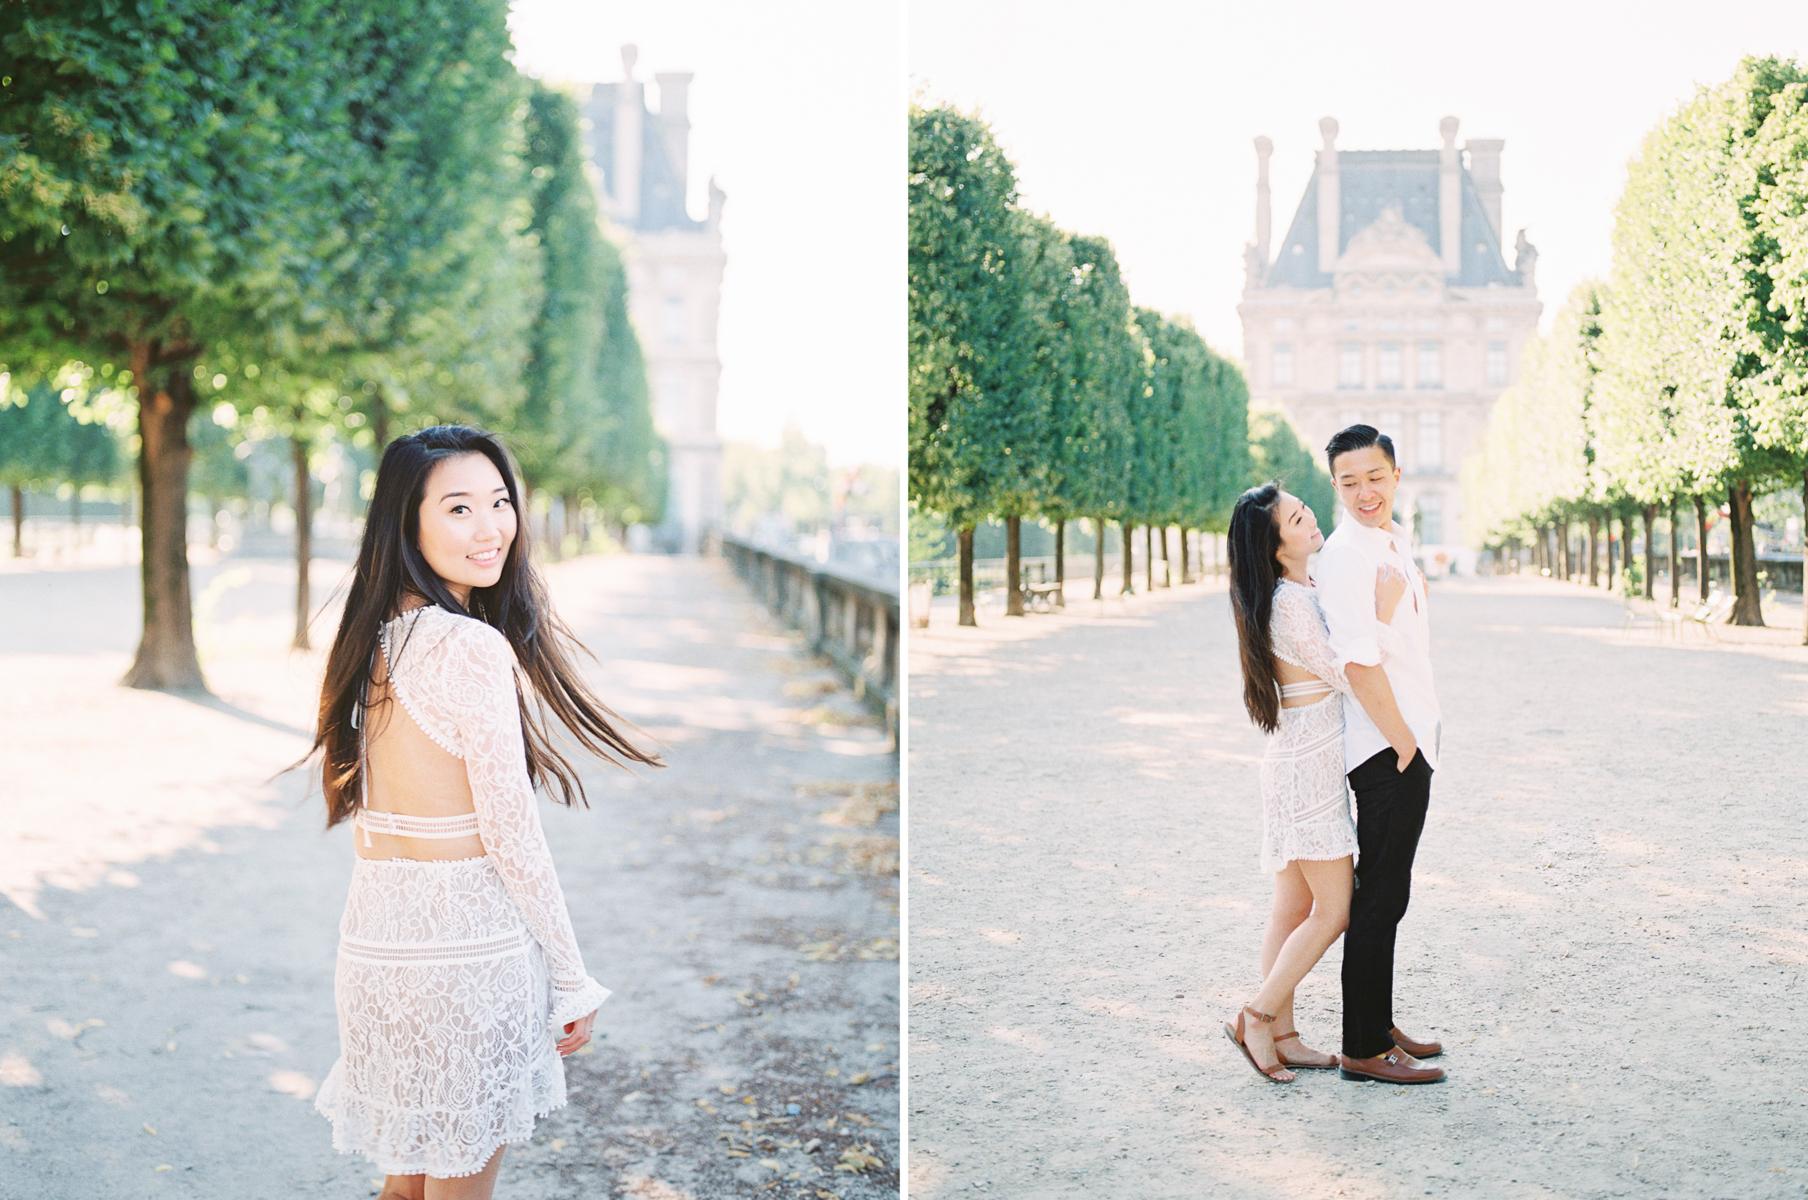 AKP_Paris_Honeymoon_Shoot_Film_Photographer-17.jpg